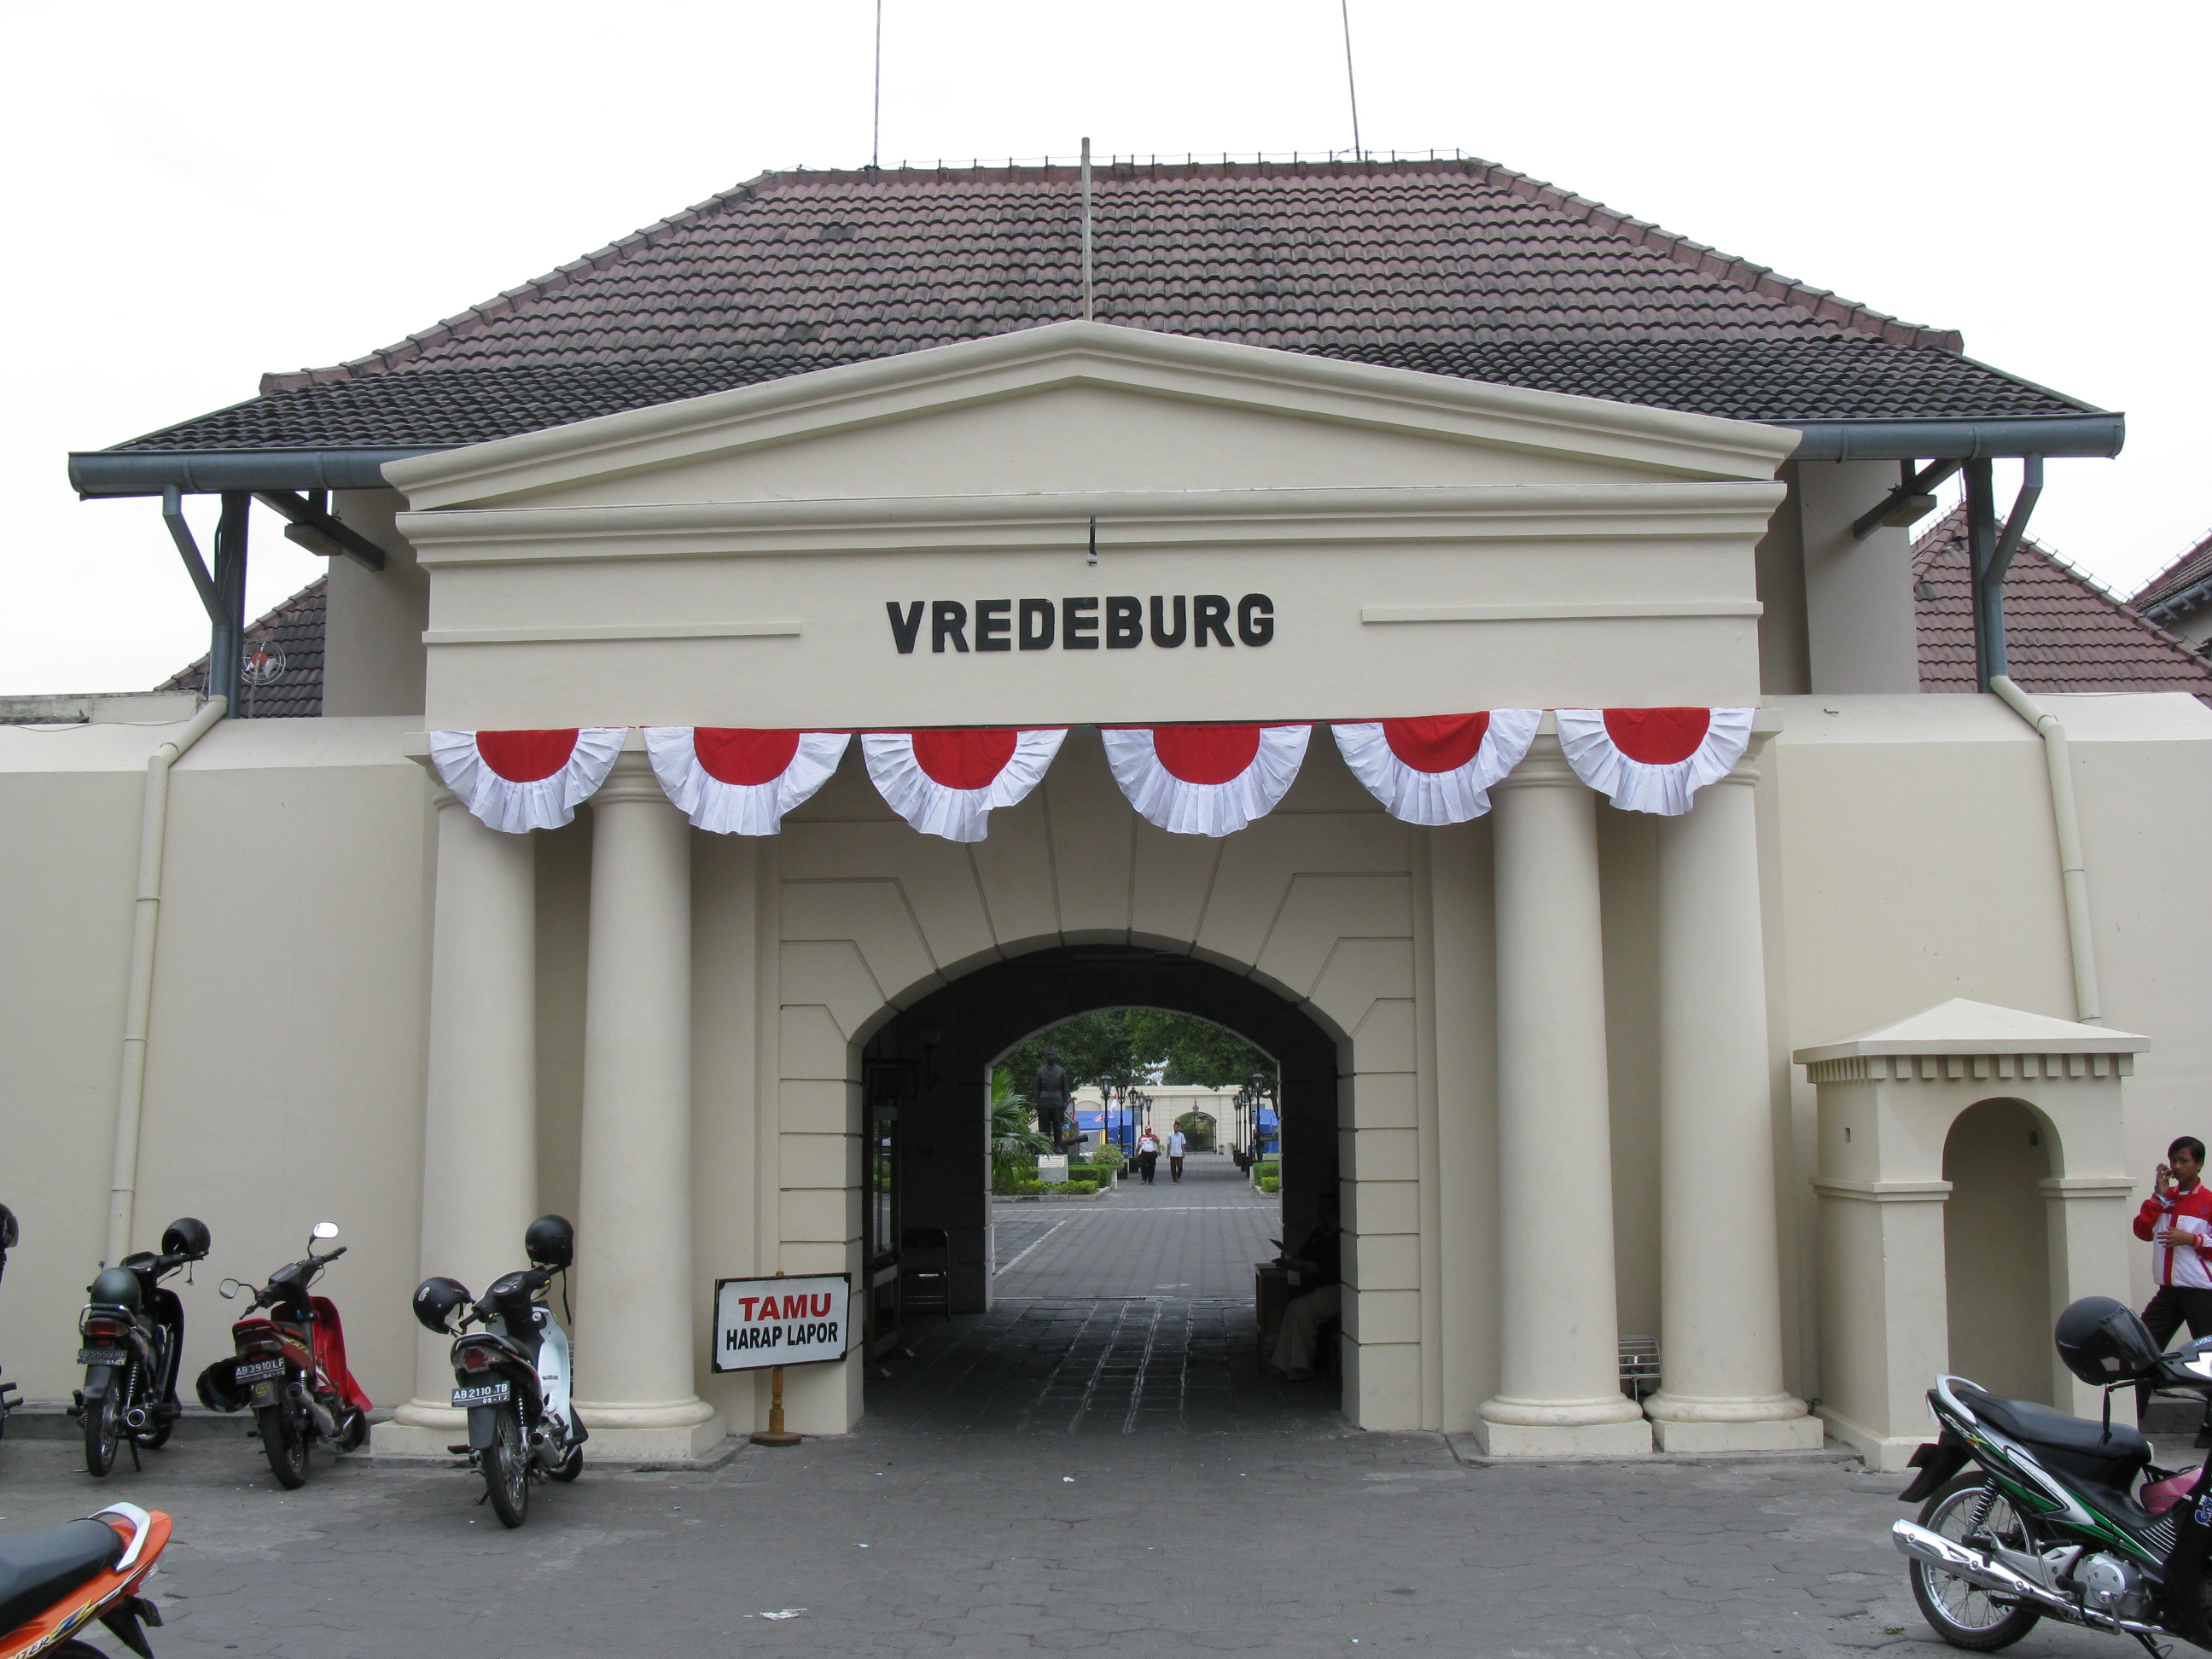 Museum Benteng Vredeburg Rk Sriwijaya Inflight Magz Kota Yogyakarta